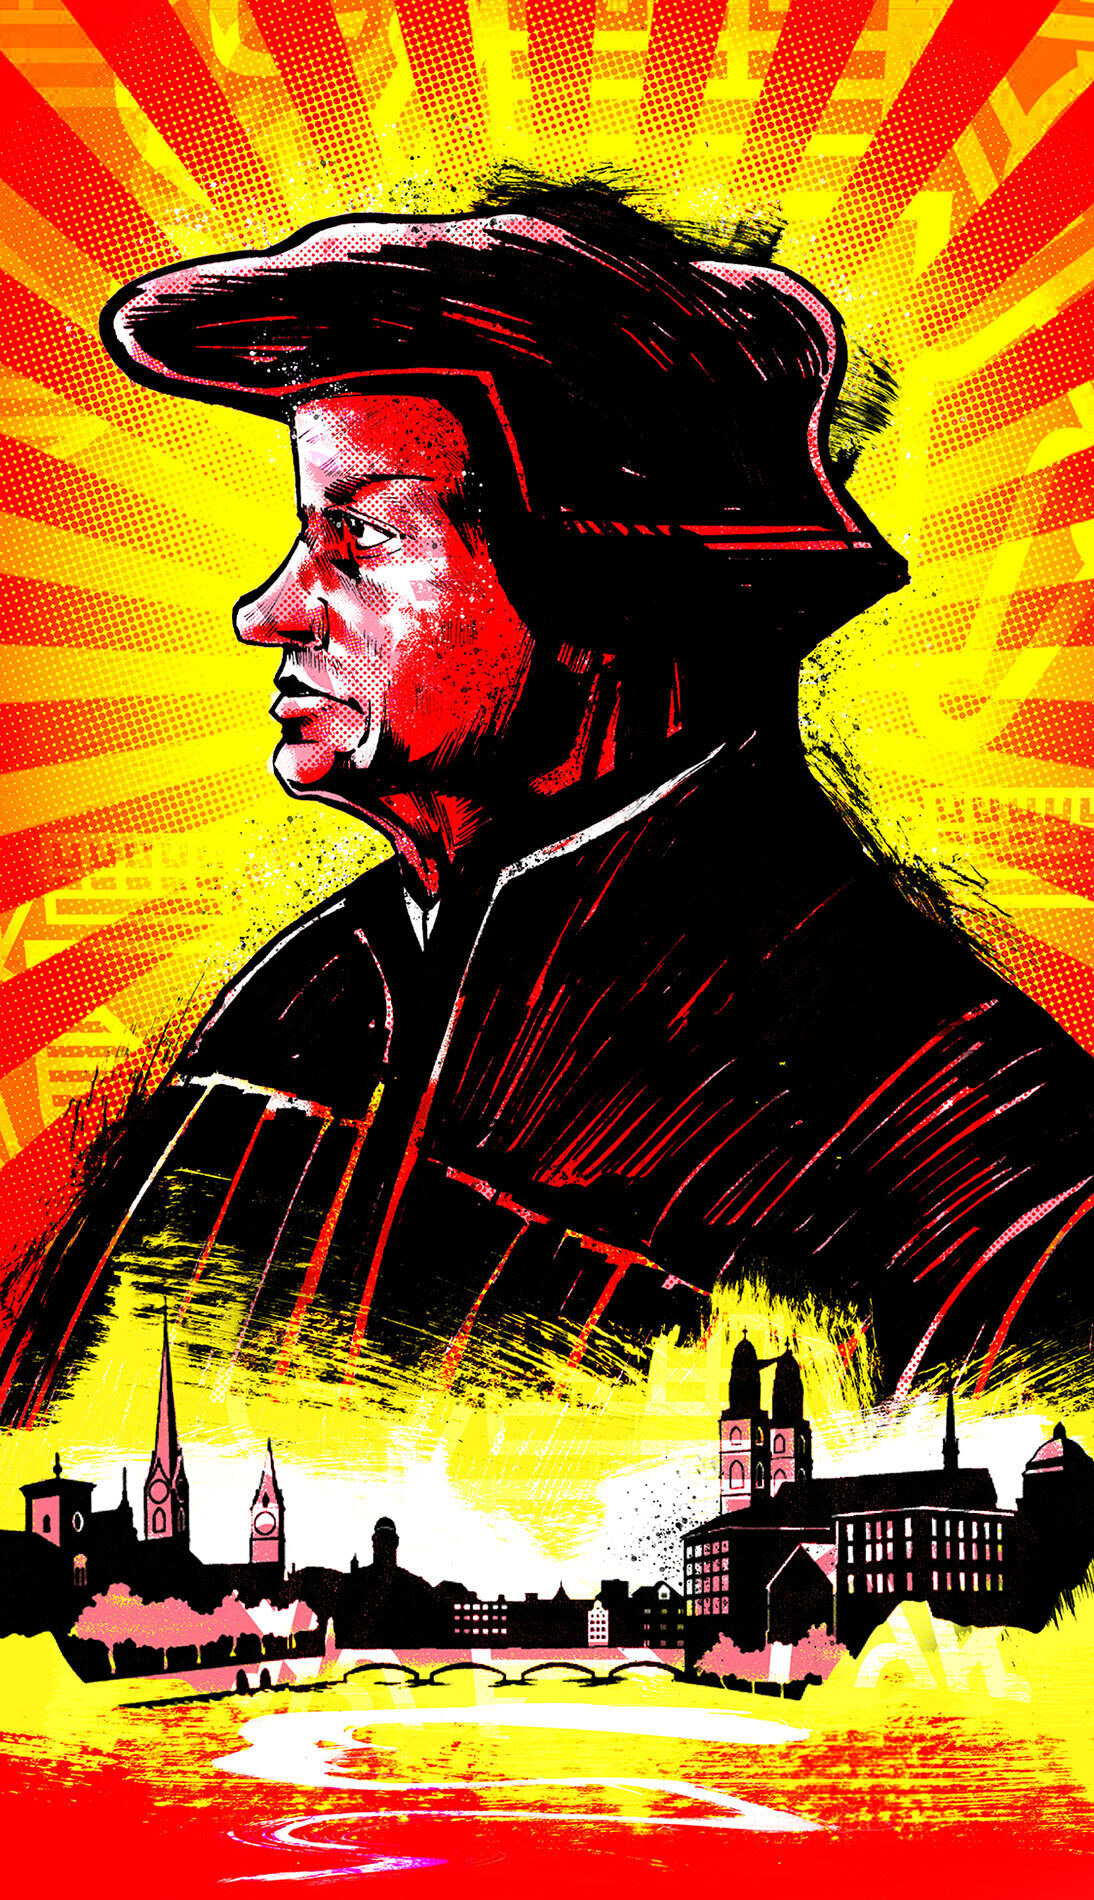 Zwingli Zuerich Illustration - Kornel Illustration | Kornel Stadler portfolio